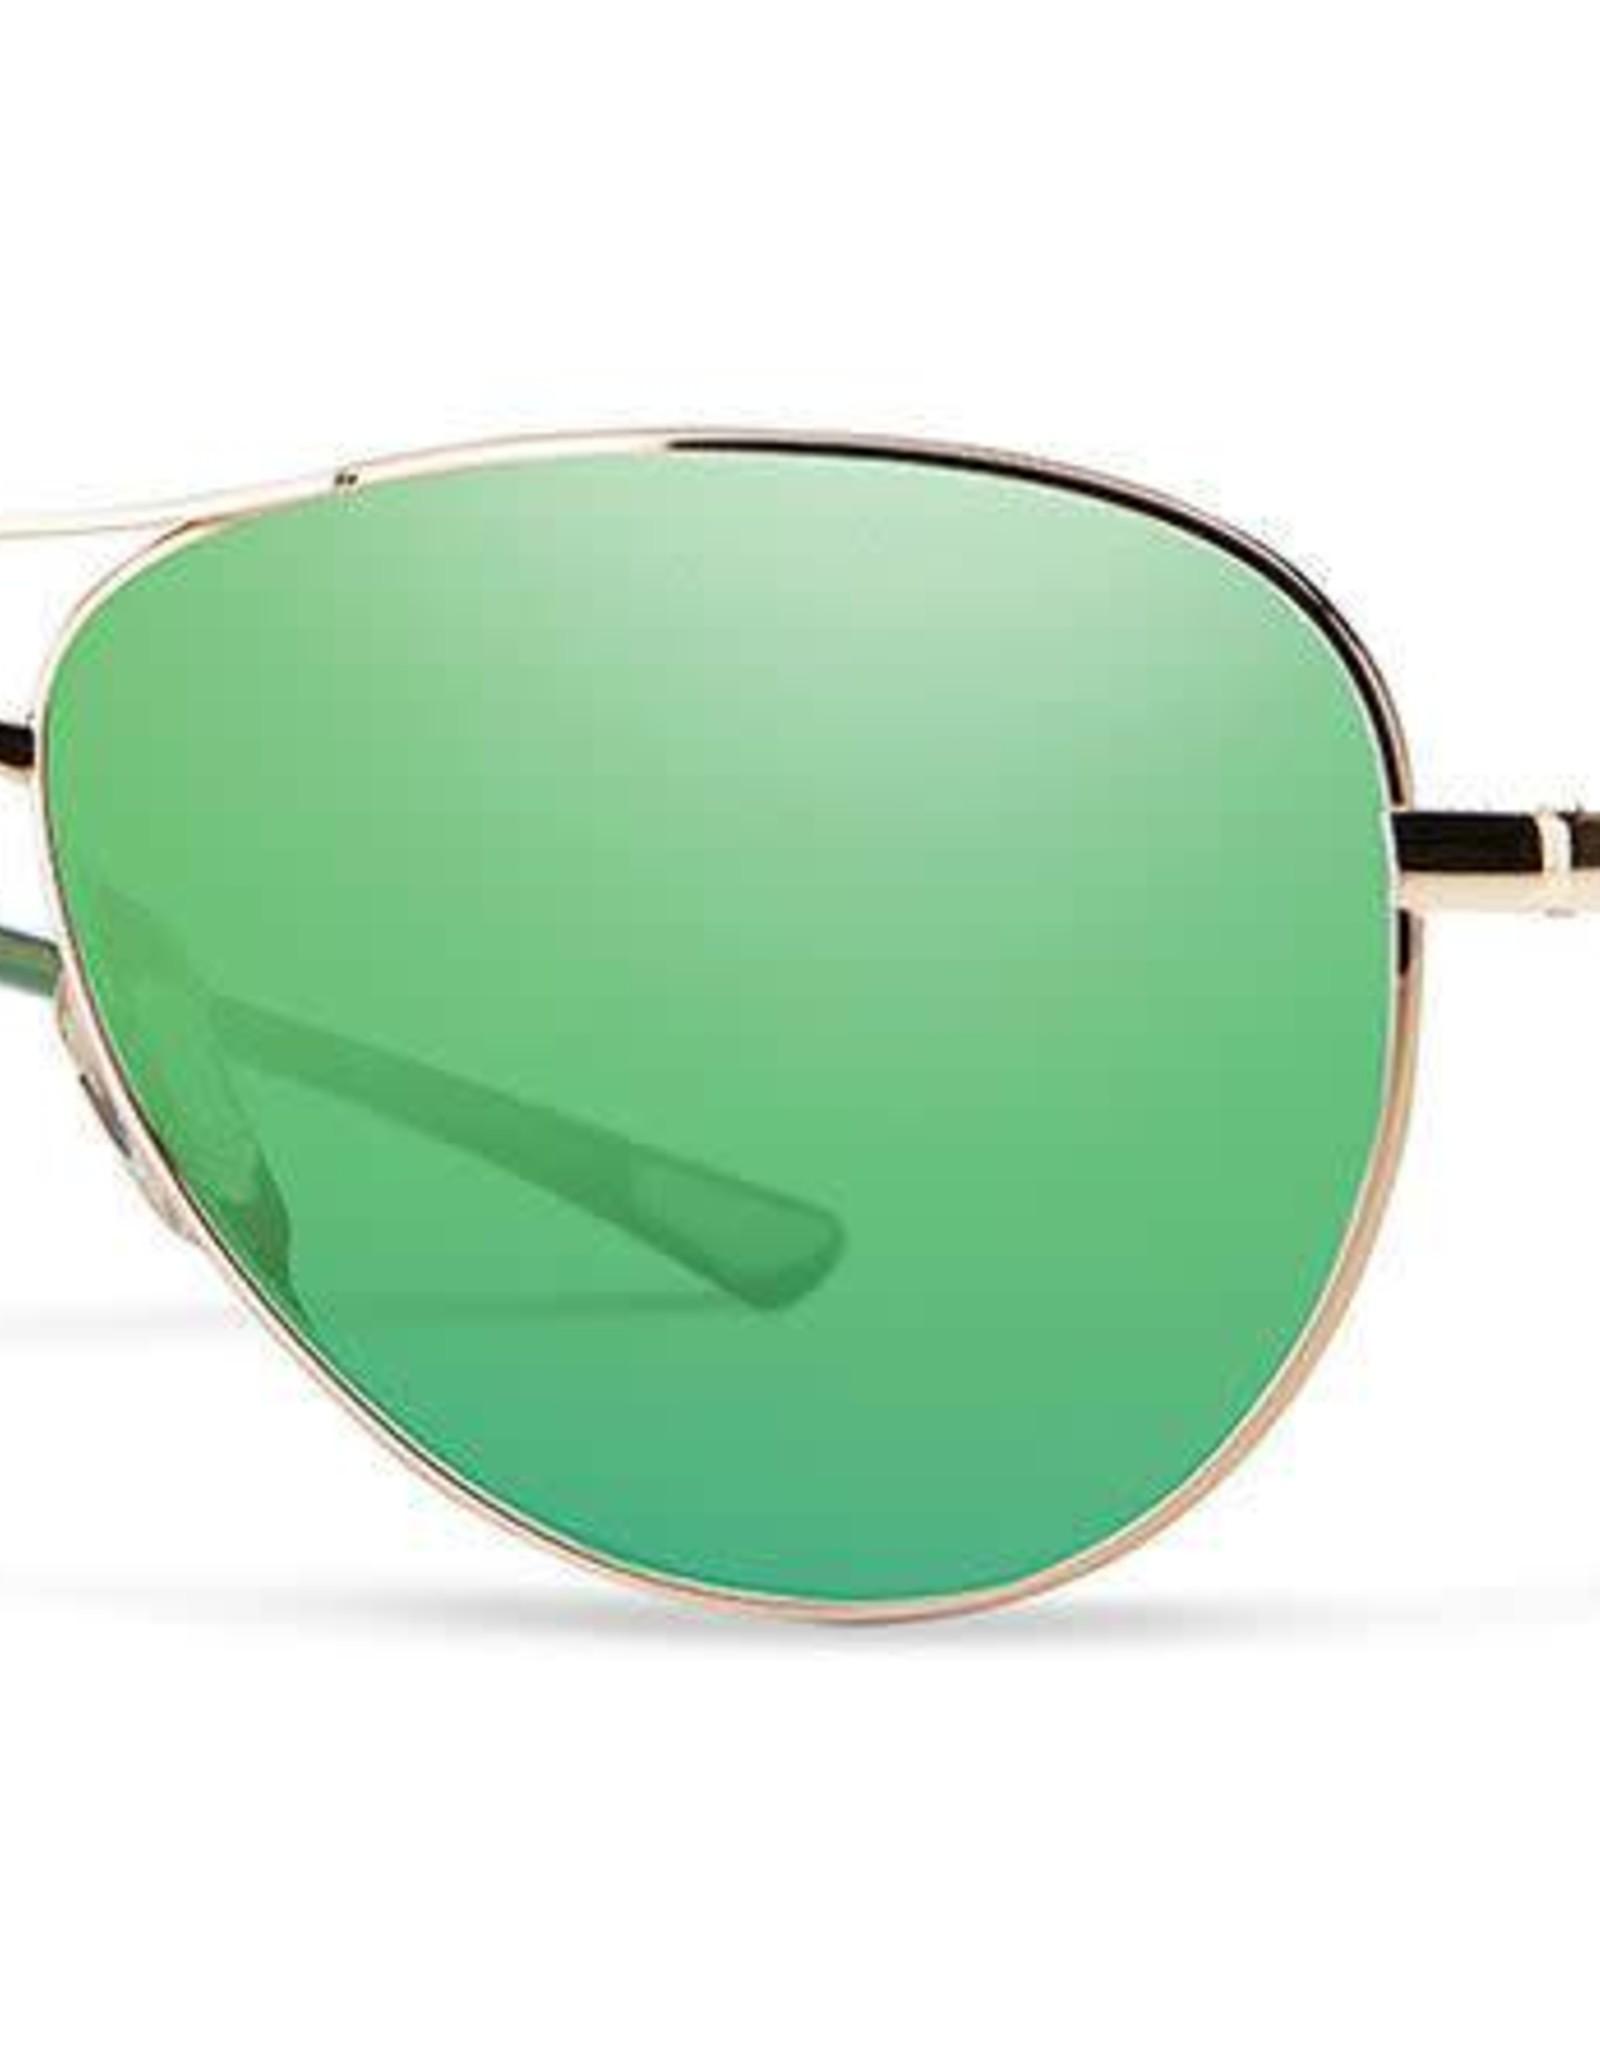 Smith Optics Smith - LANGLEY - Gold w/ Green Mirror